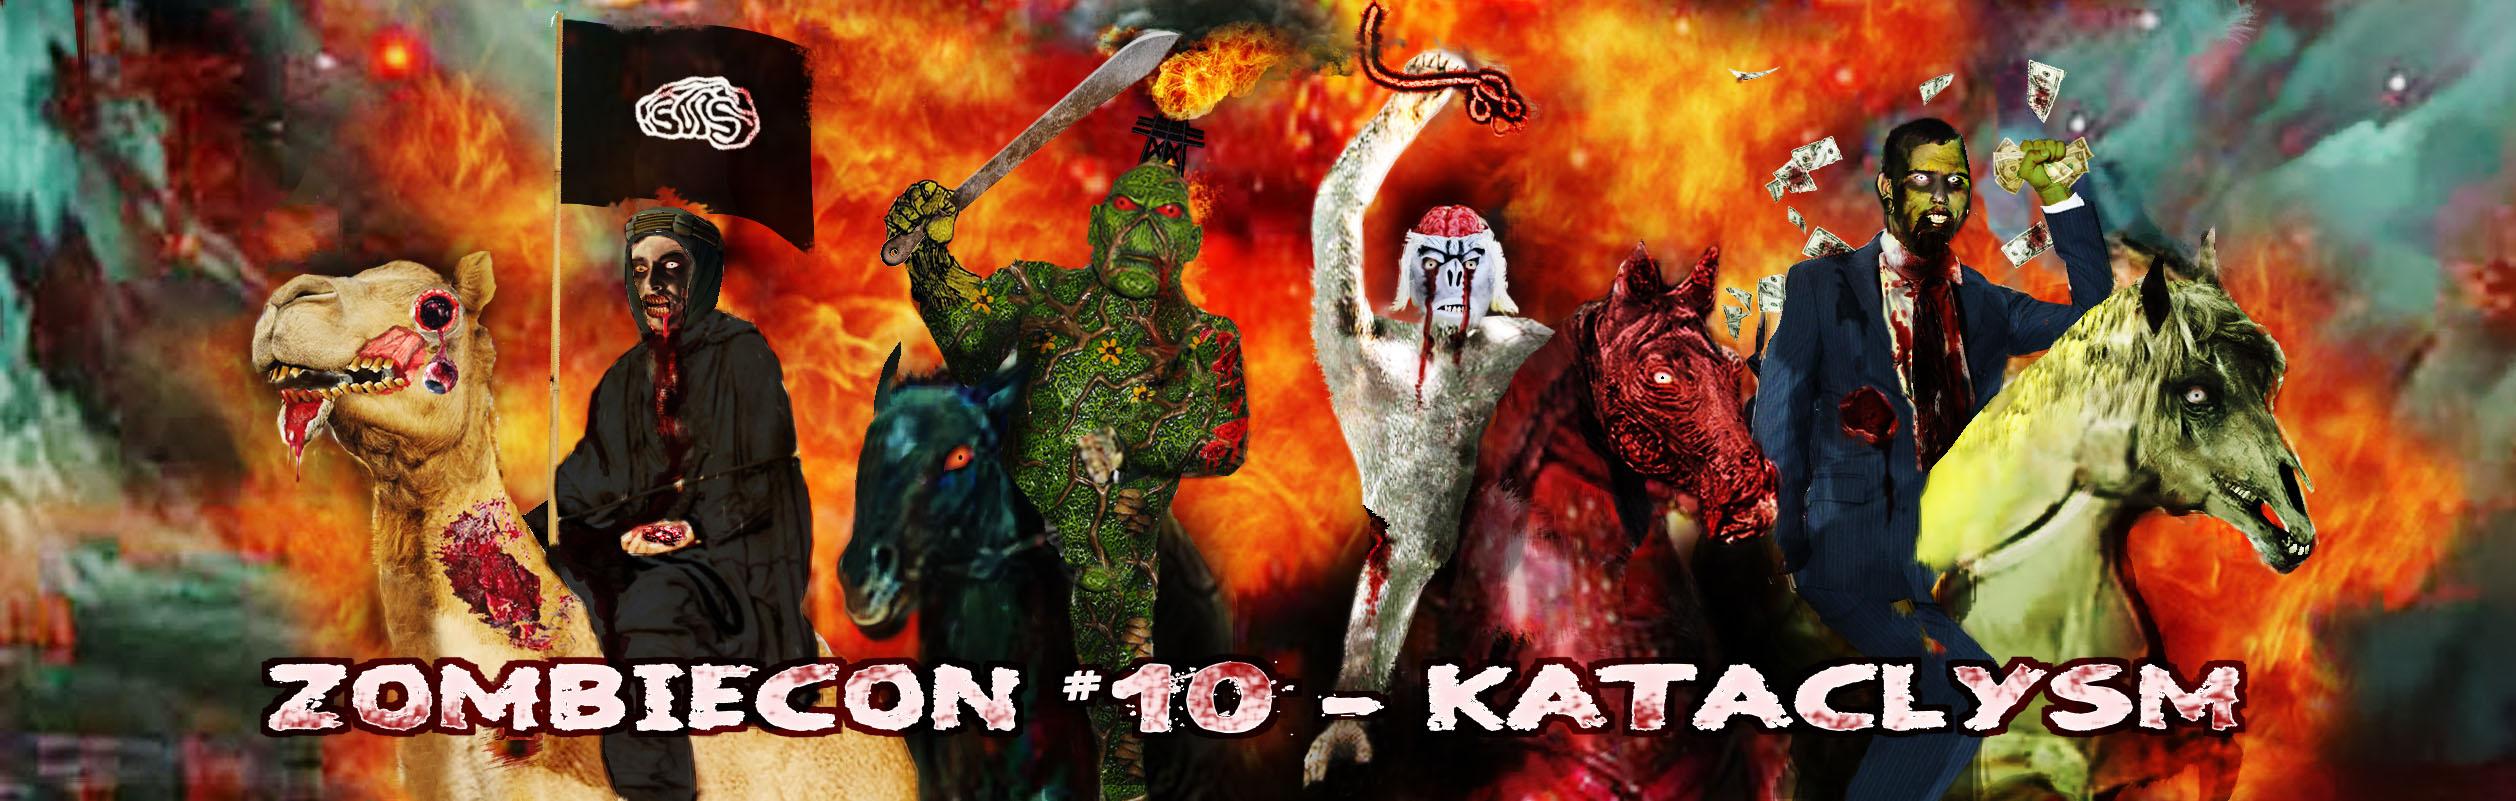 Kataclysm Banner